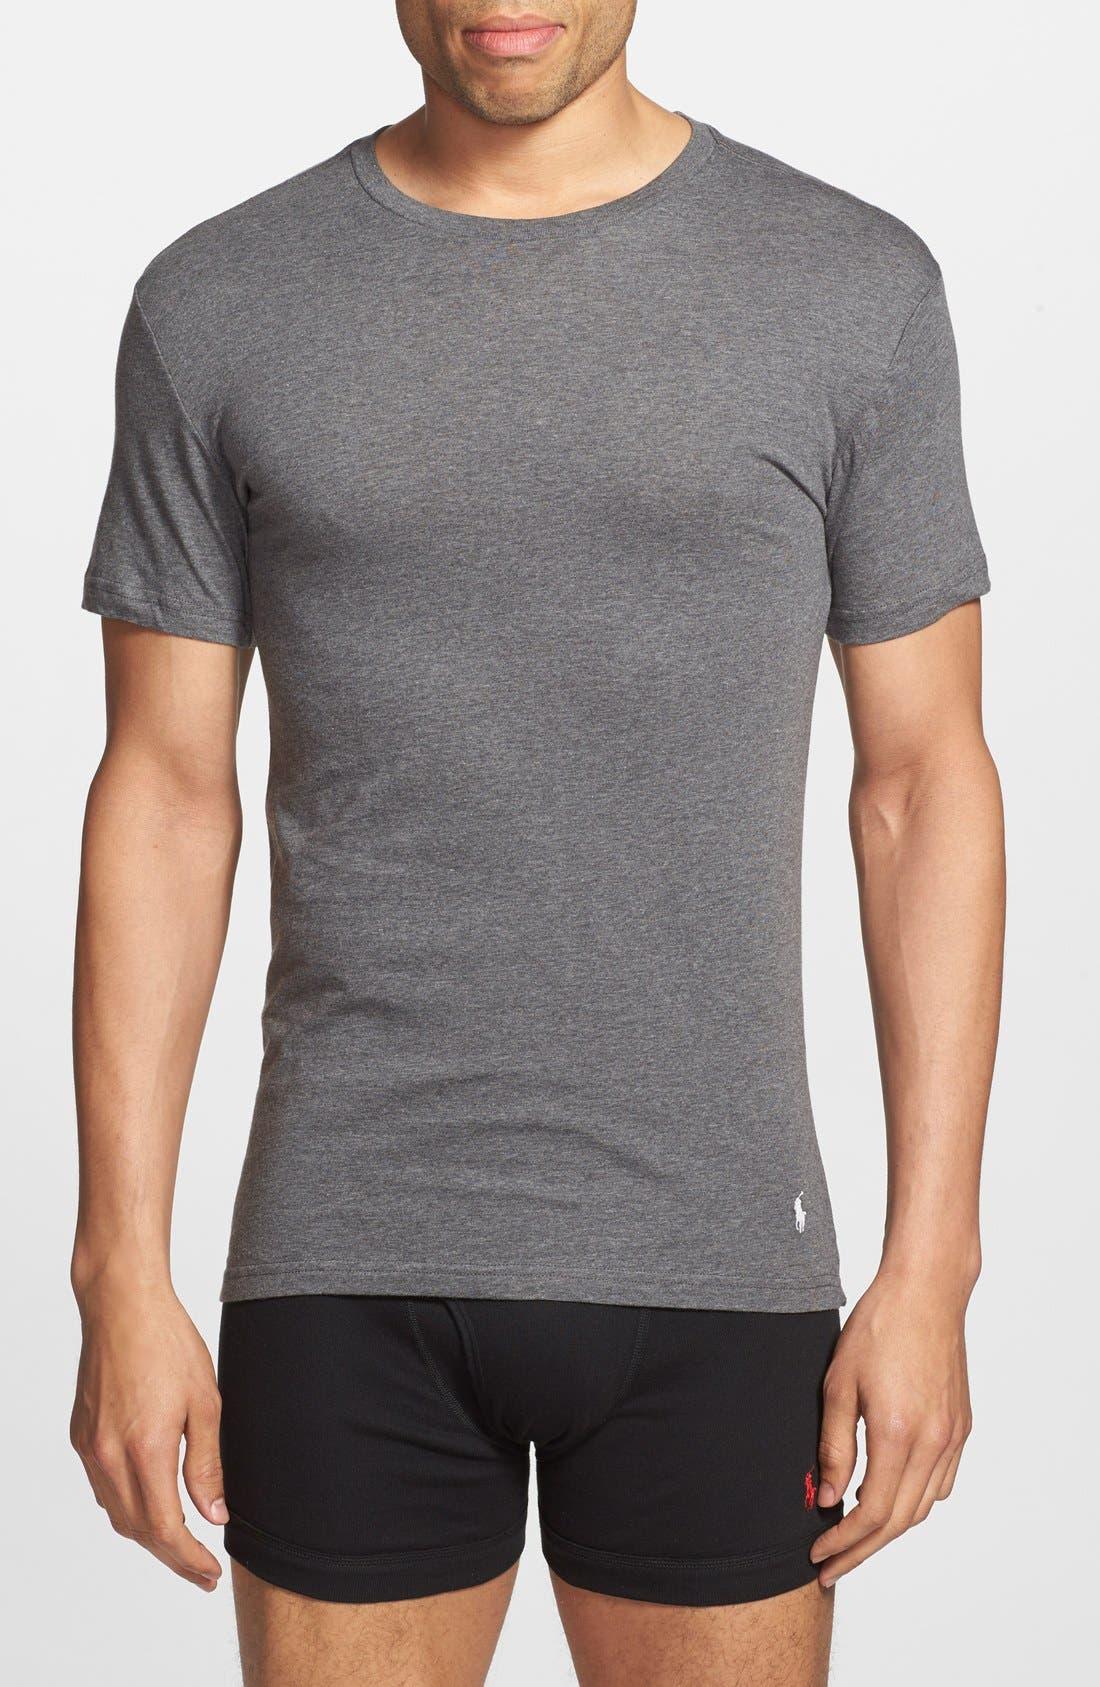 3-Pack Slim Fit T-Shirt,                         Main,                         color, BLACK/ GREY/ CHARCOAL